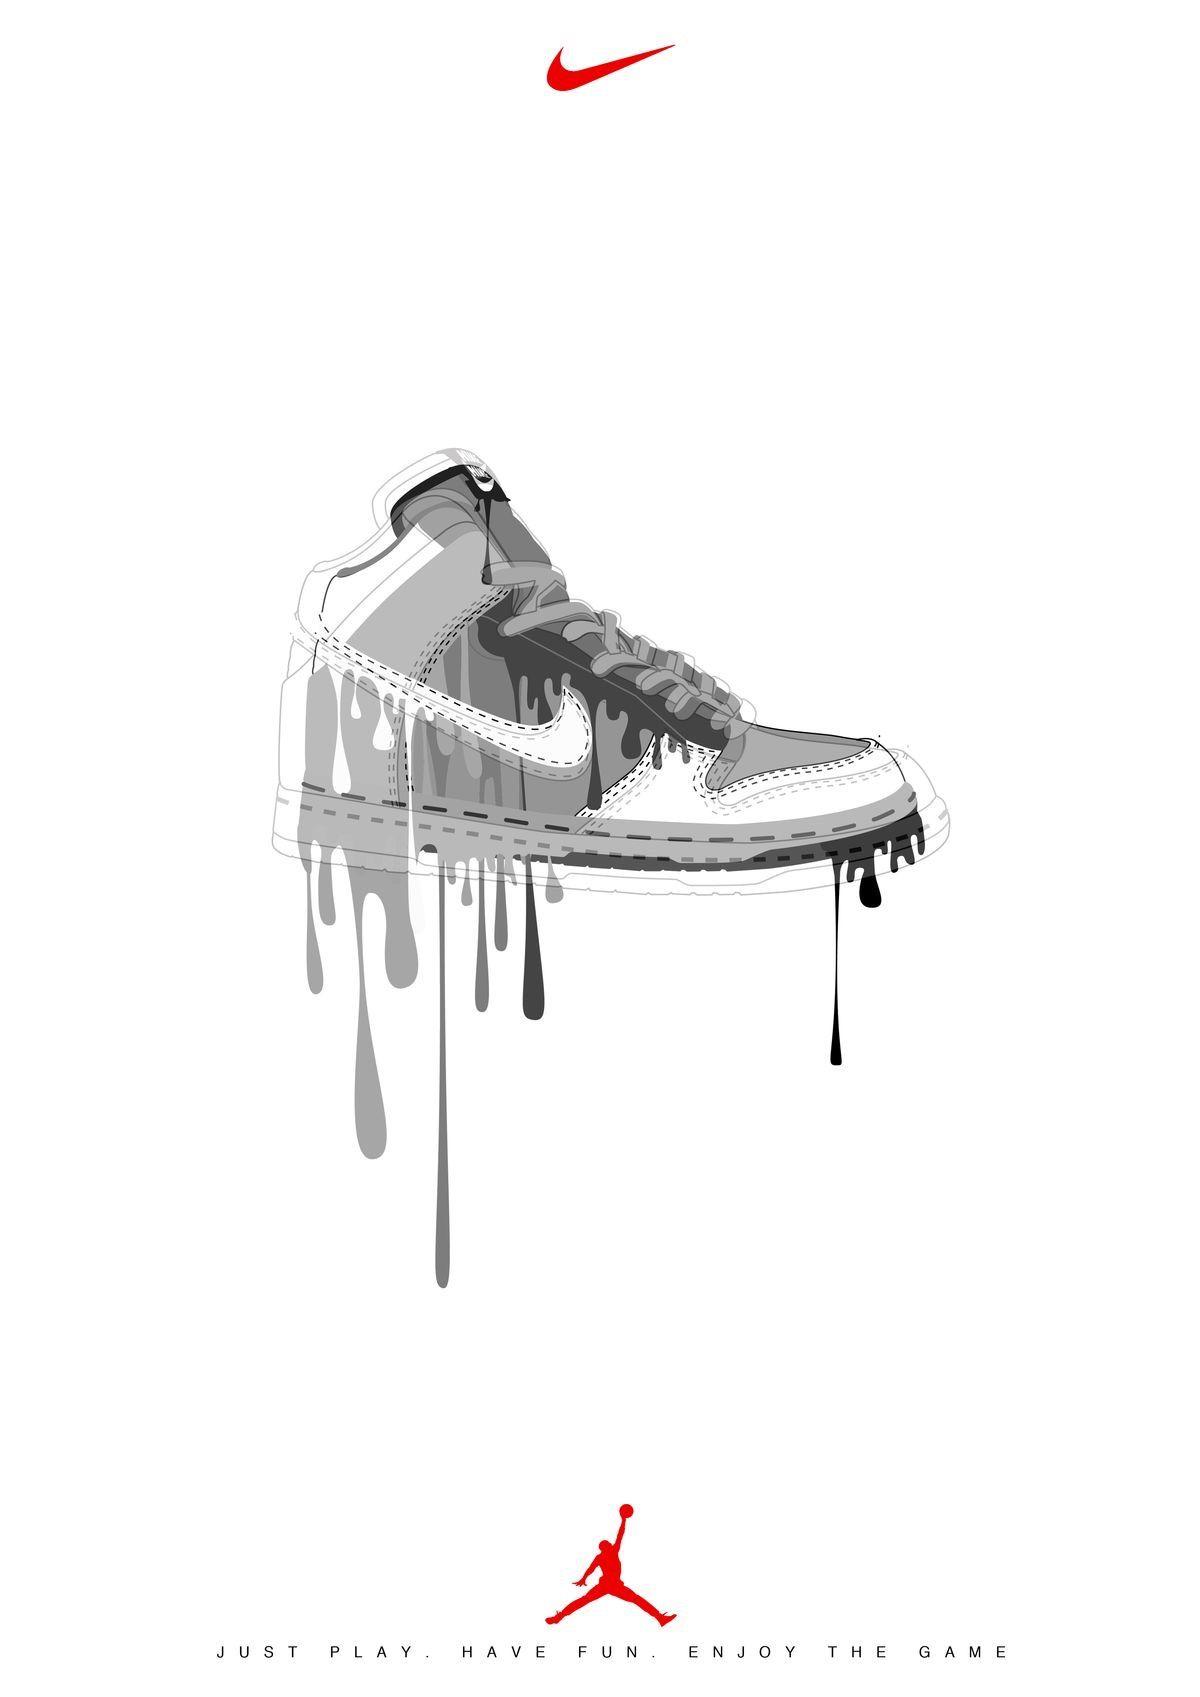 Pin By Jessie Dior On Sneakers Nike Art Nike Drawing Sneaker Art